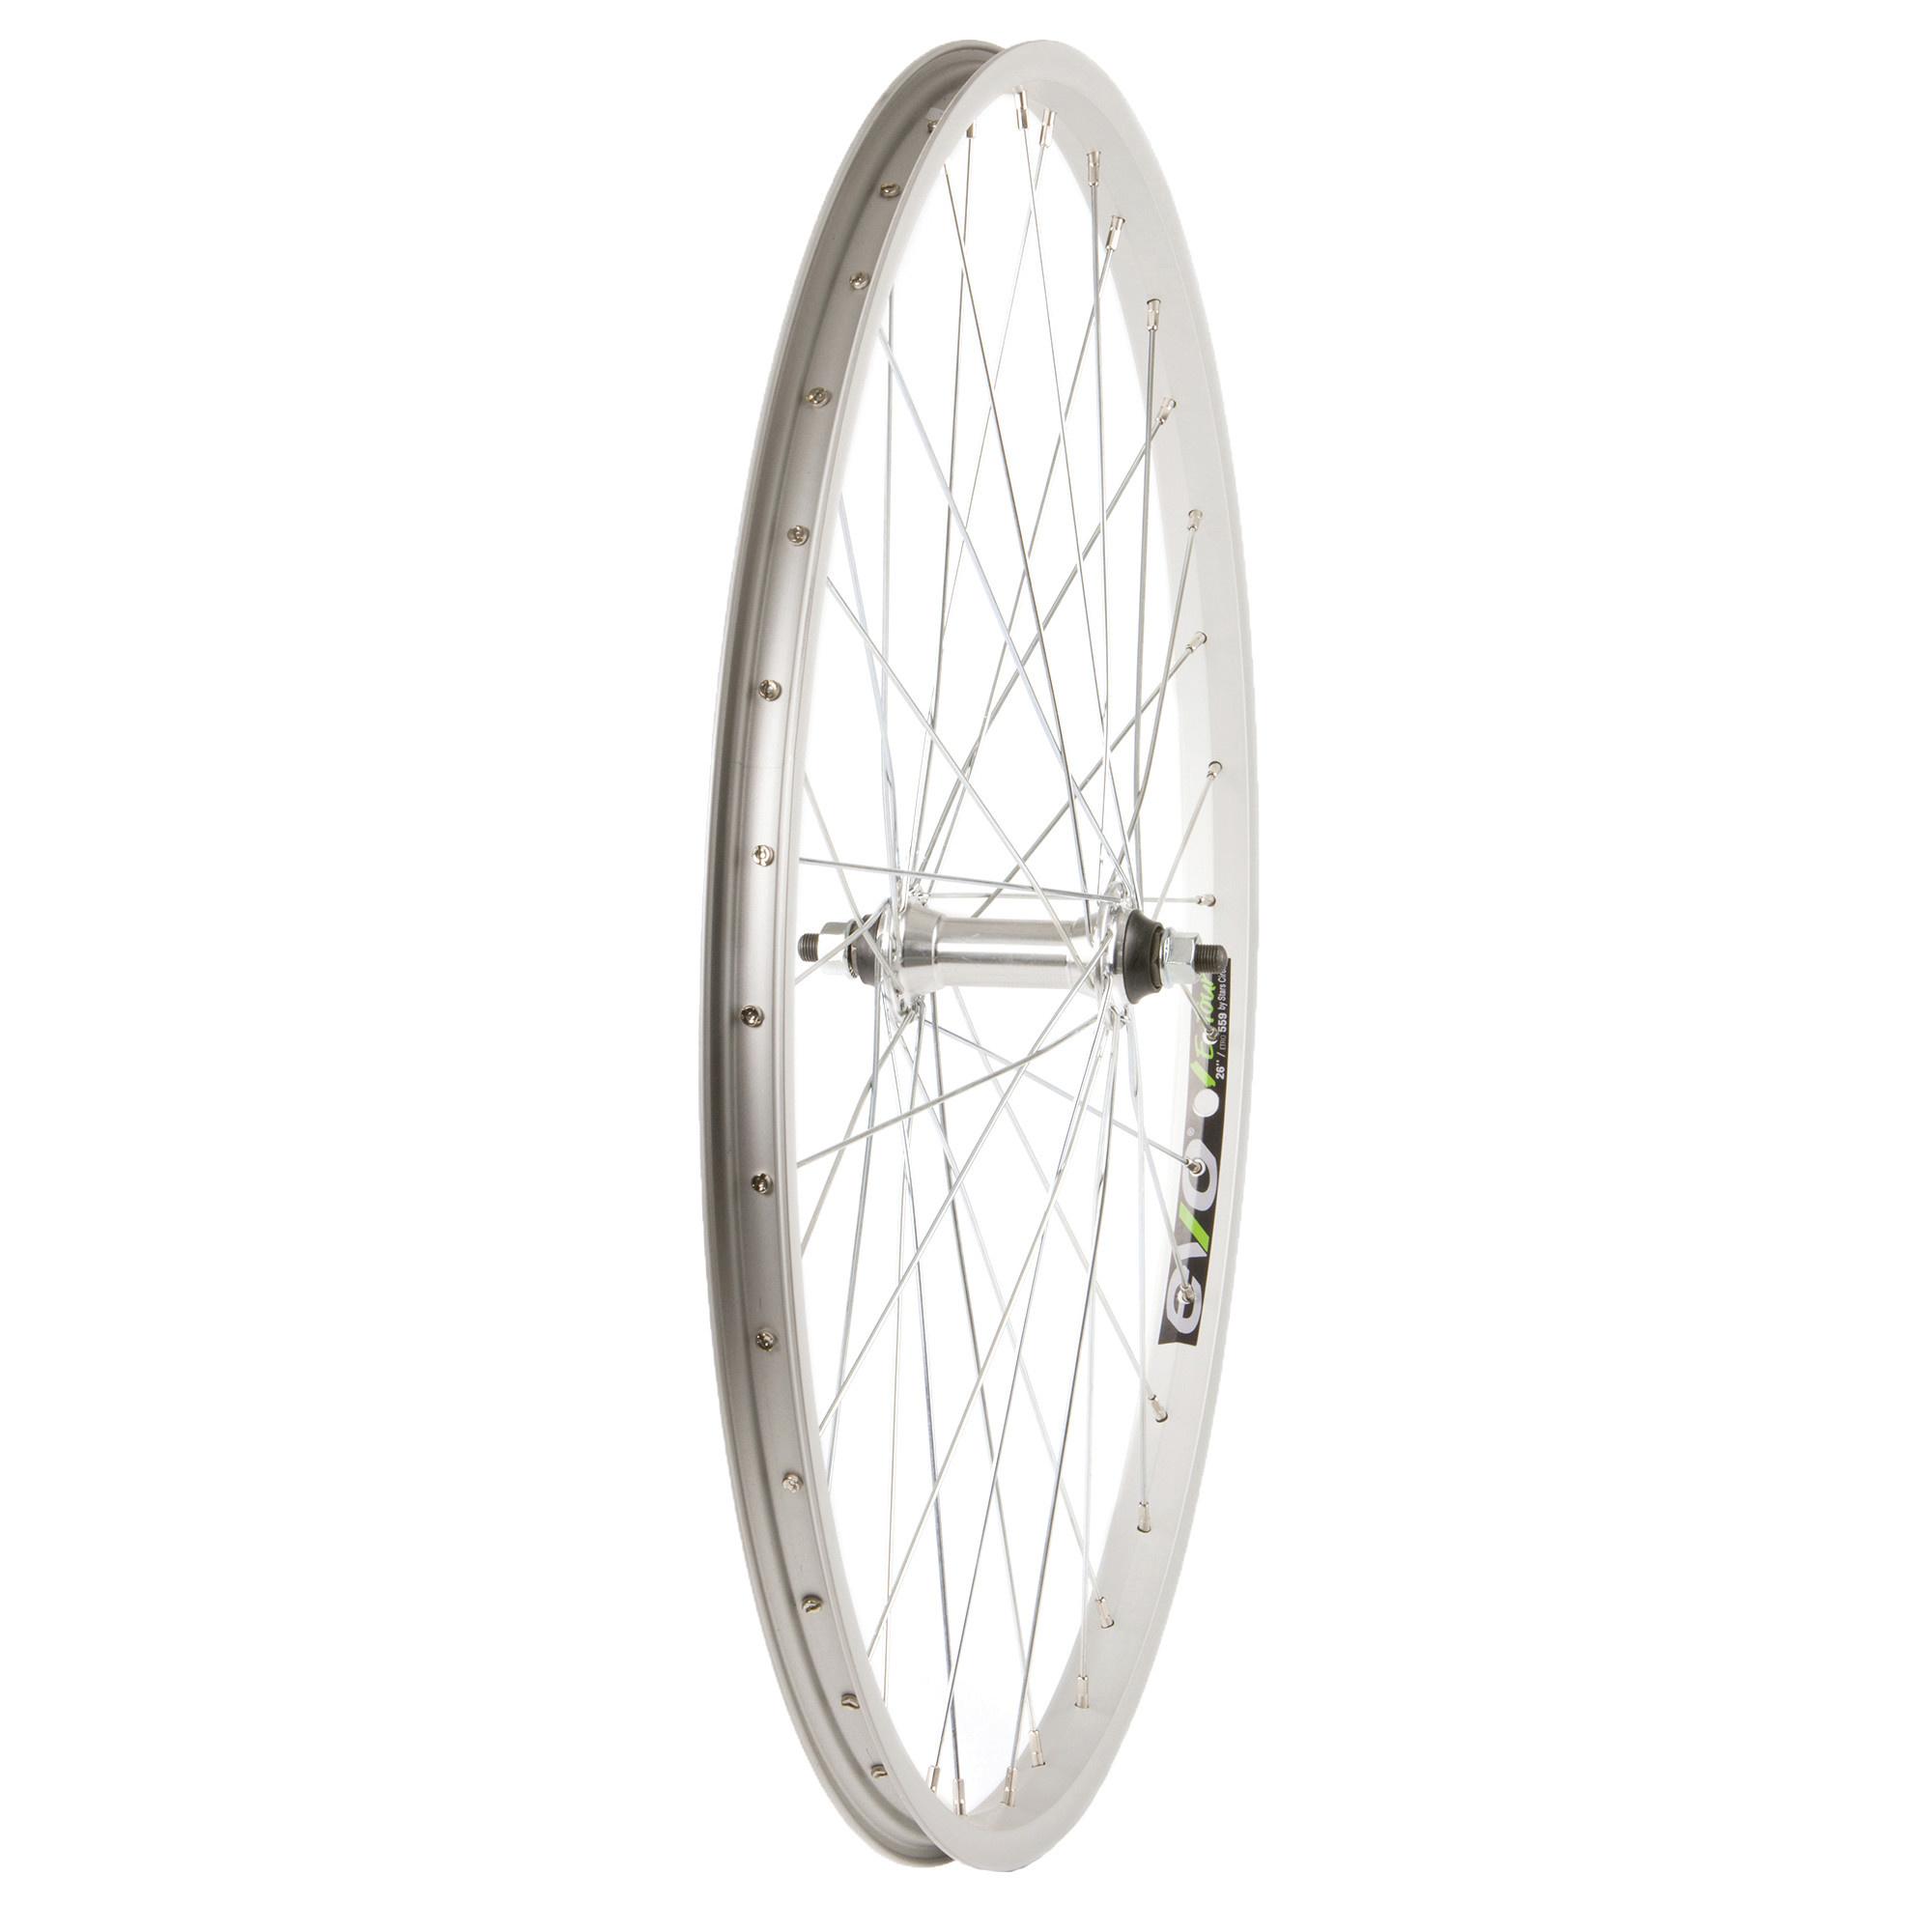 "WHEEL SHOP Wheel Shp, Frnt 26"" Wheel, 36H Silver Ally Single Wall Ev E Tur 20/ Silver Frmula FM-21 Nutted Axle Hub, Steel Spkes"